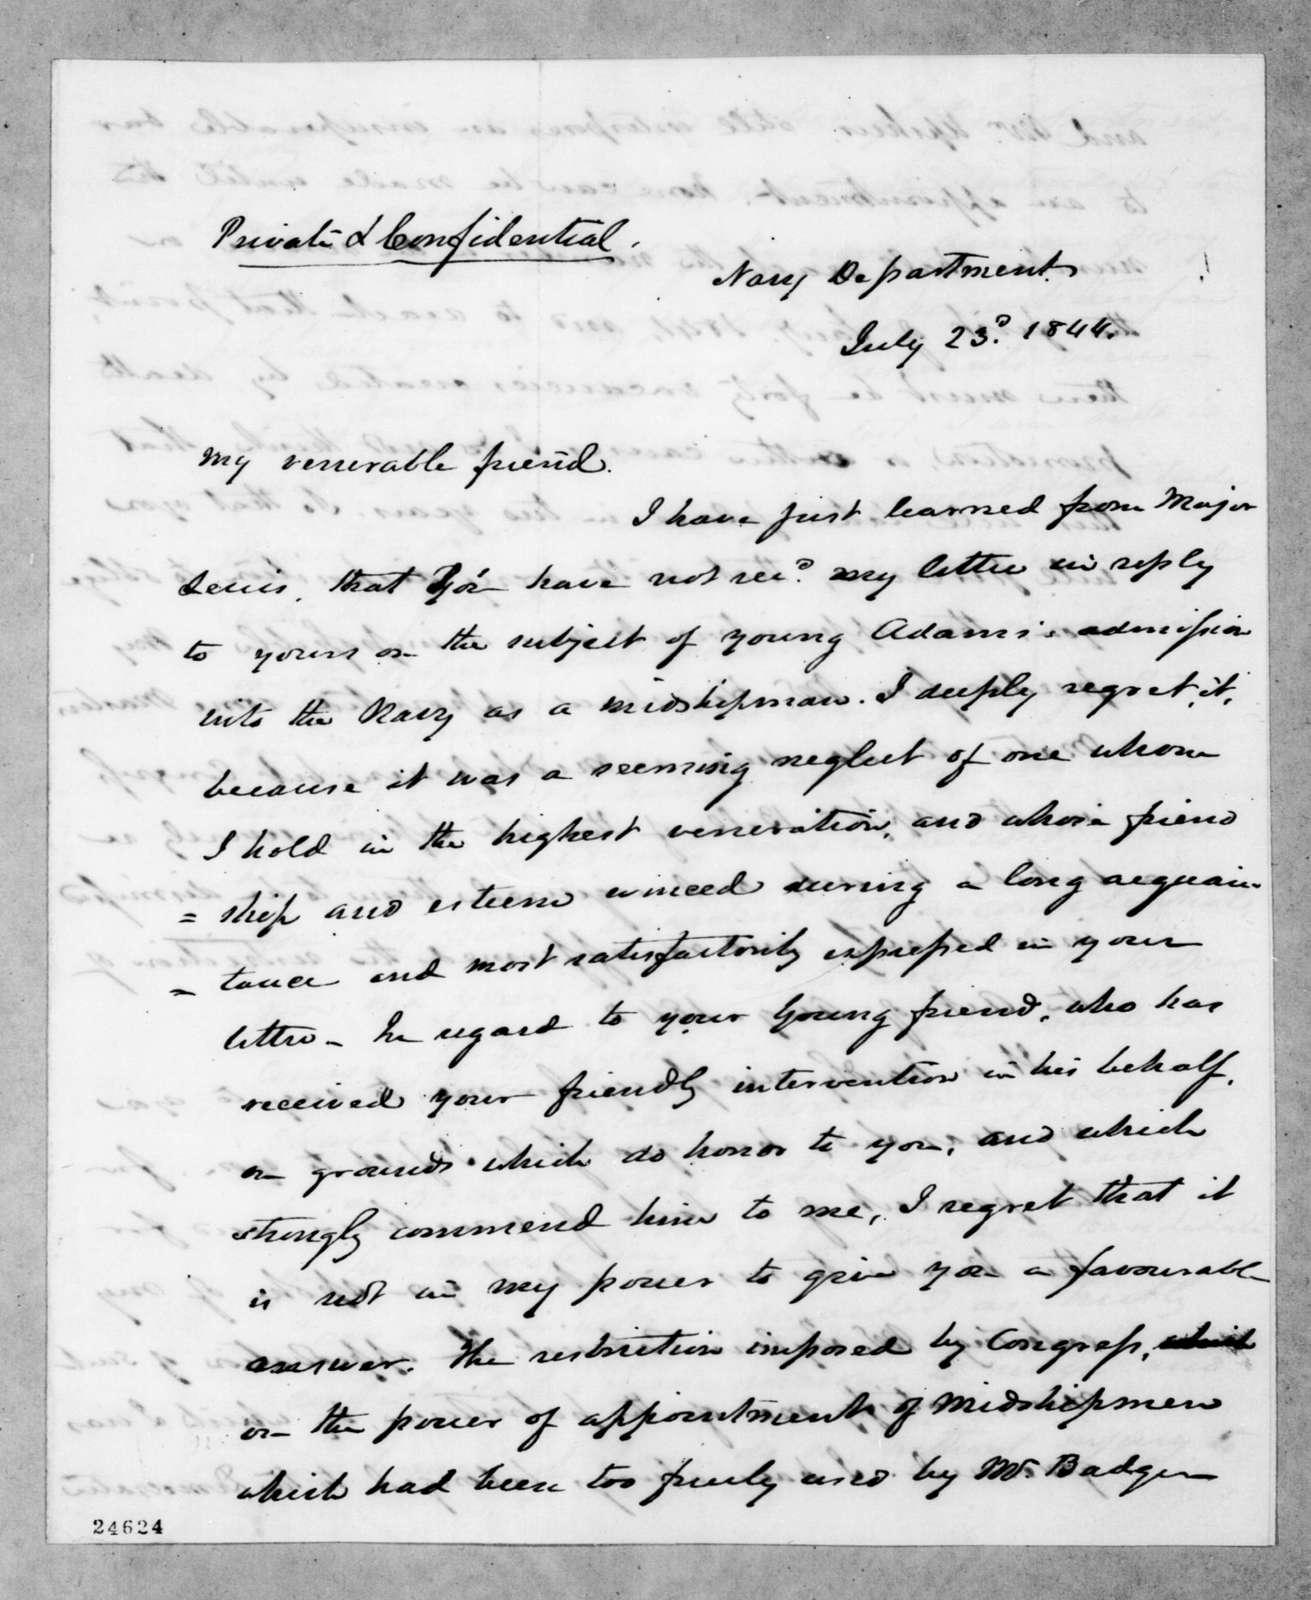 John Young Mason to Andrew Jackson, July 23, 1844